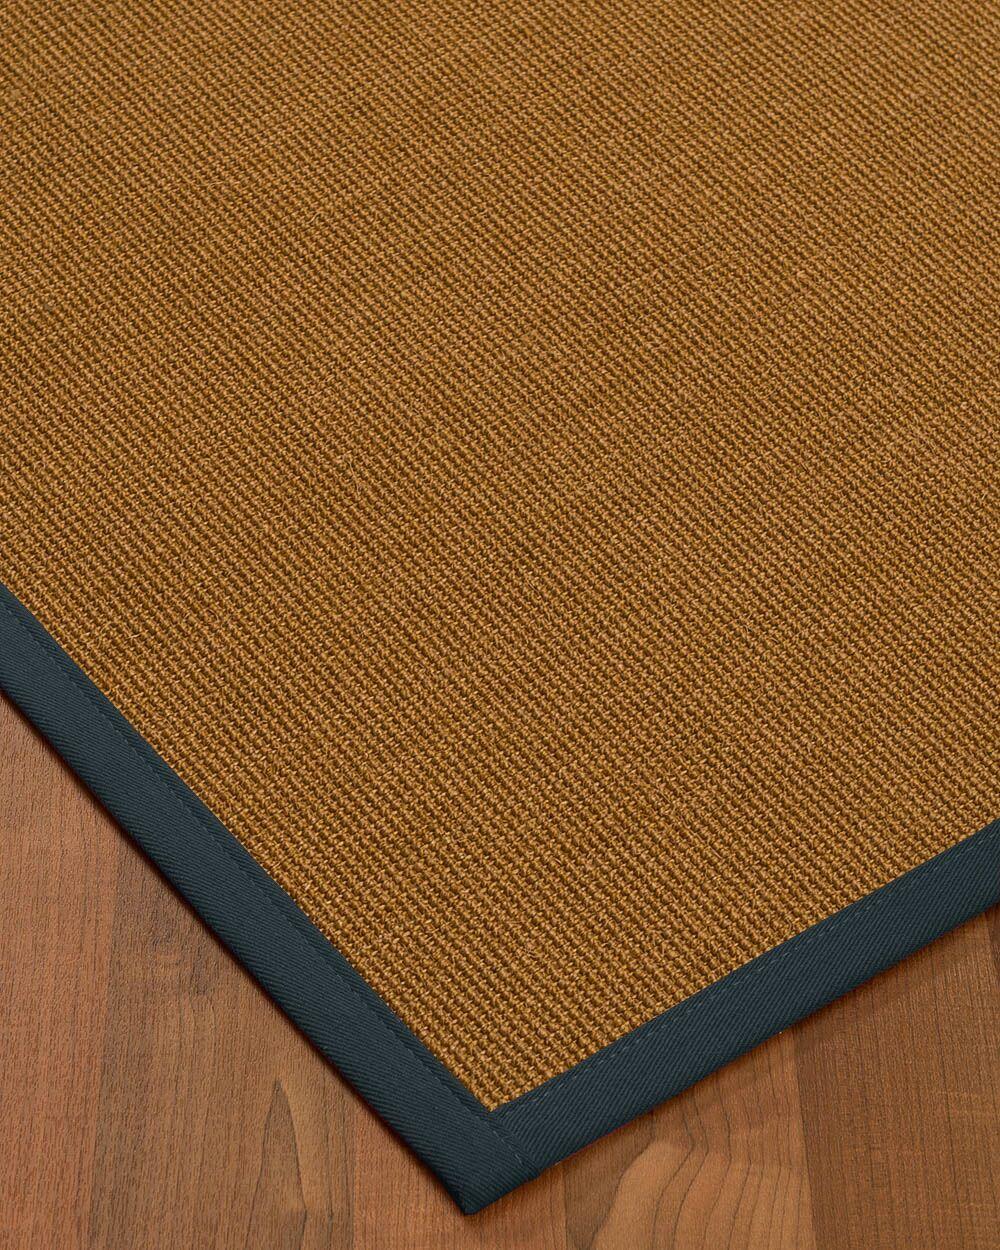 Antonina Border Hand-Woven Brown/Marine Area Rug Rug Size: Rectangle 8' x 10', Rug Pad Included: Yes